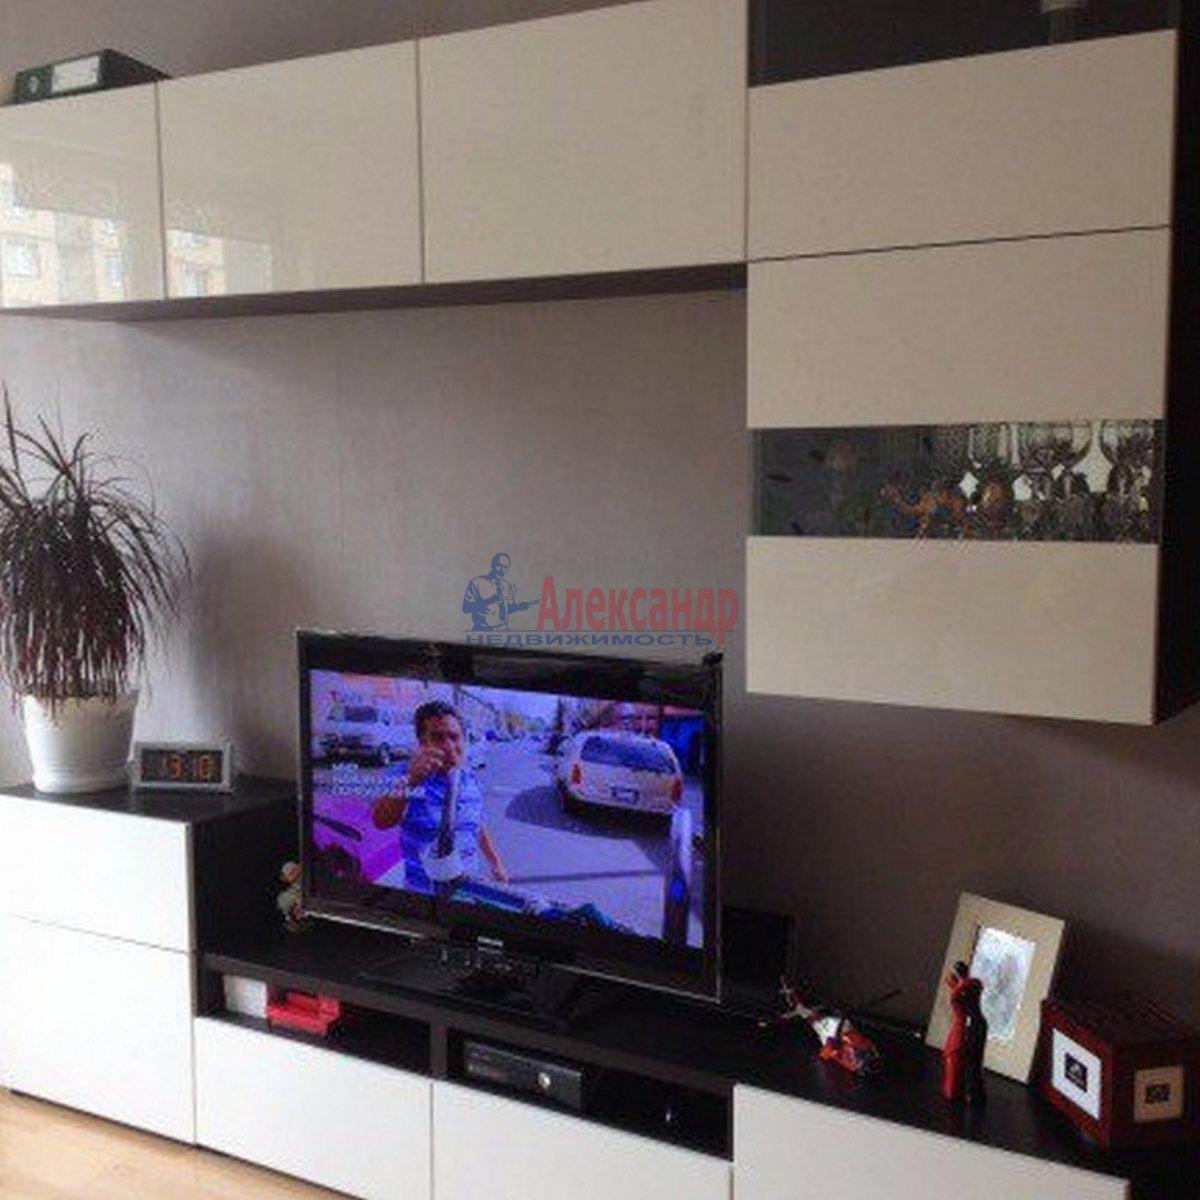 2-комнатная квартира (54м2) в аренду по адресу Елизарова пр., 18— фото 1 из 8